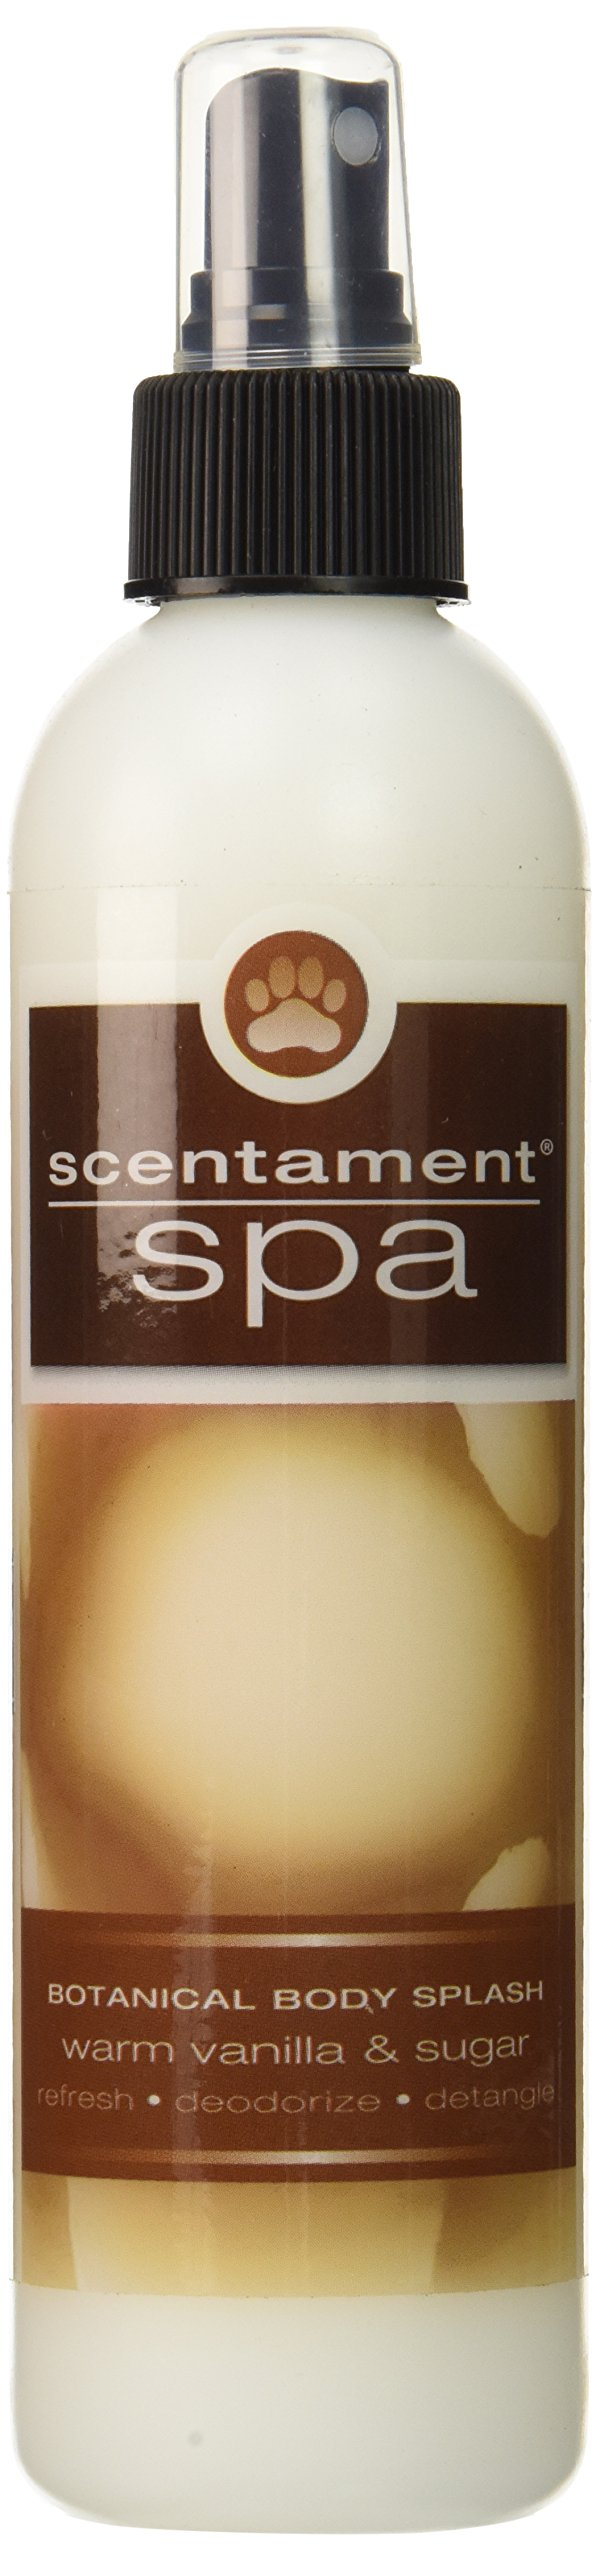 Best Shot Pet Scentament Spa Warm Vanilla Sugar Body Splash Spray, 8 oz